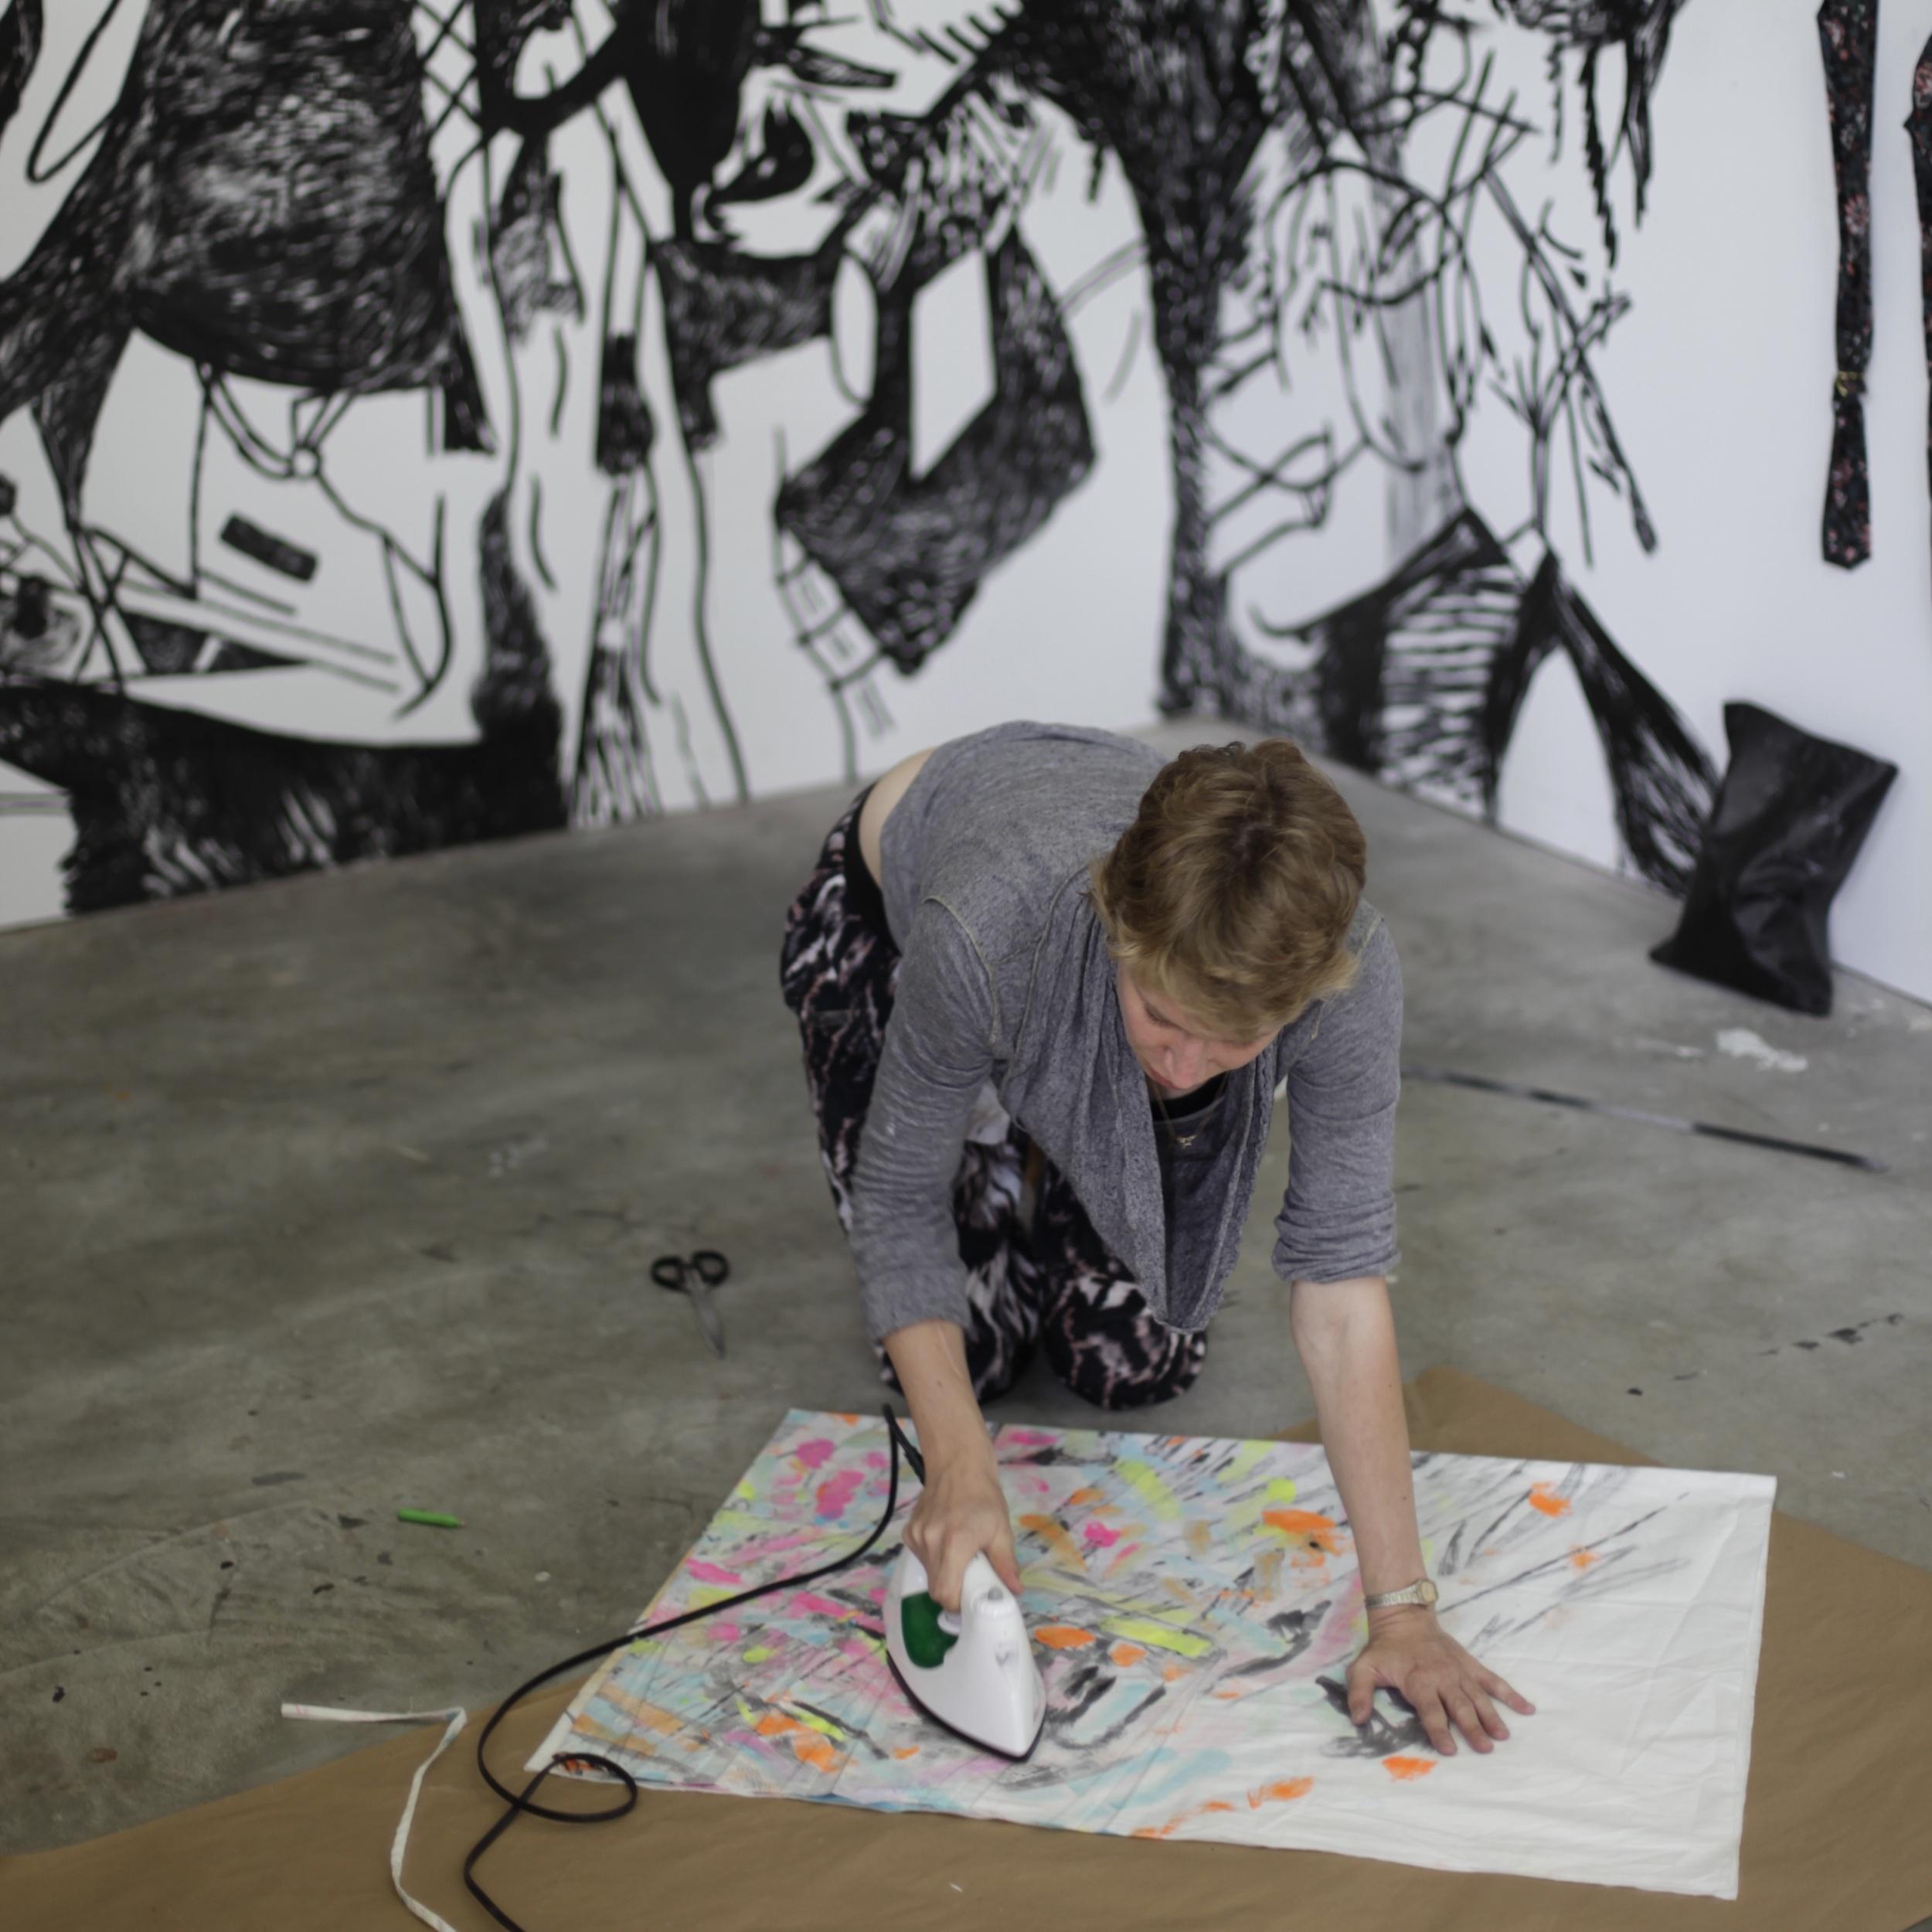 Artist Ivonne Dipman at work at the Skowhegan School of Painting & Sculpture